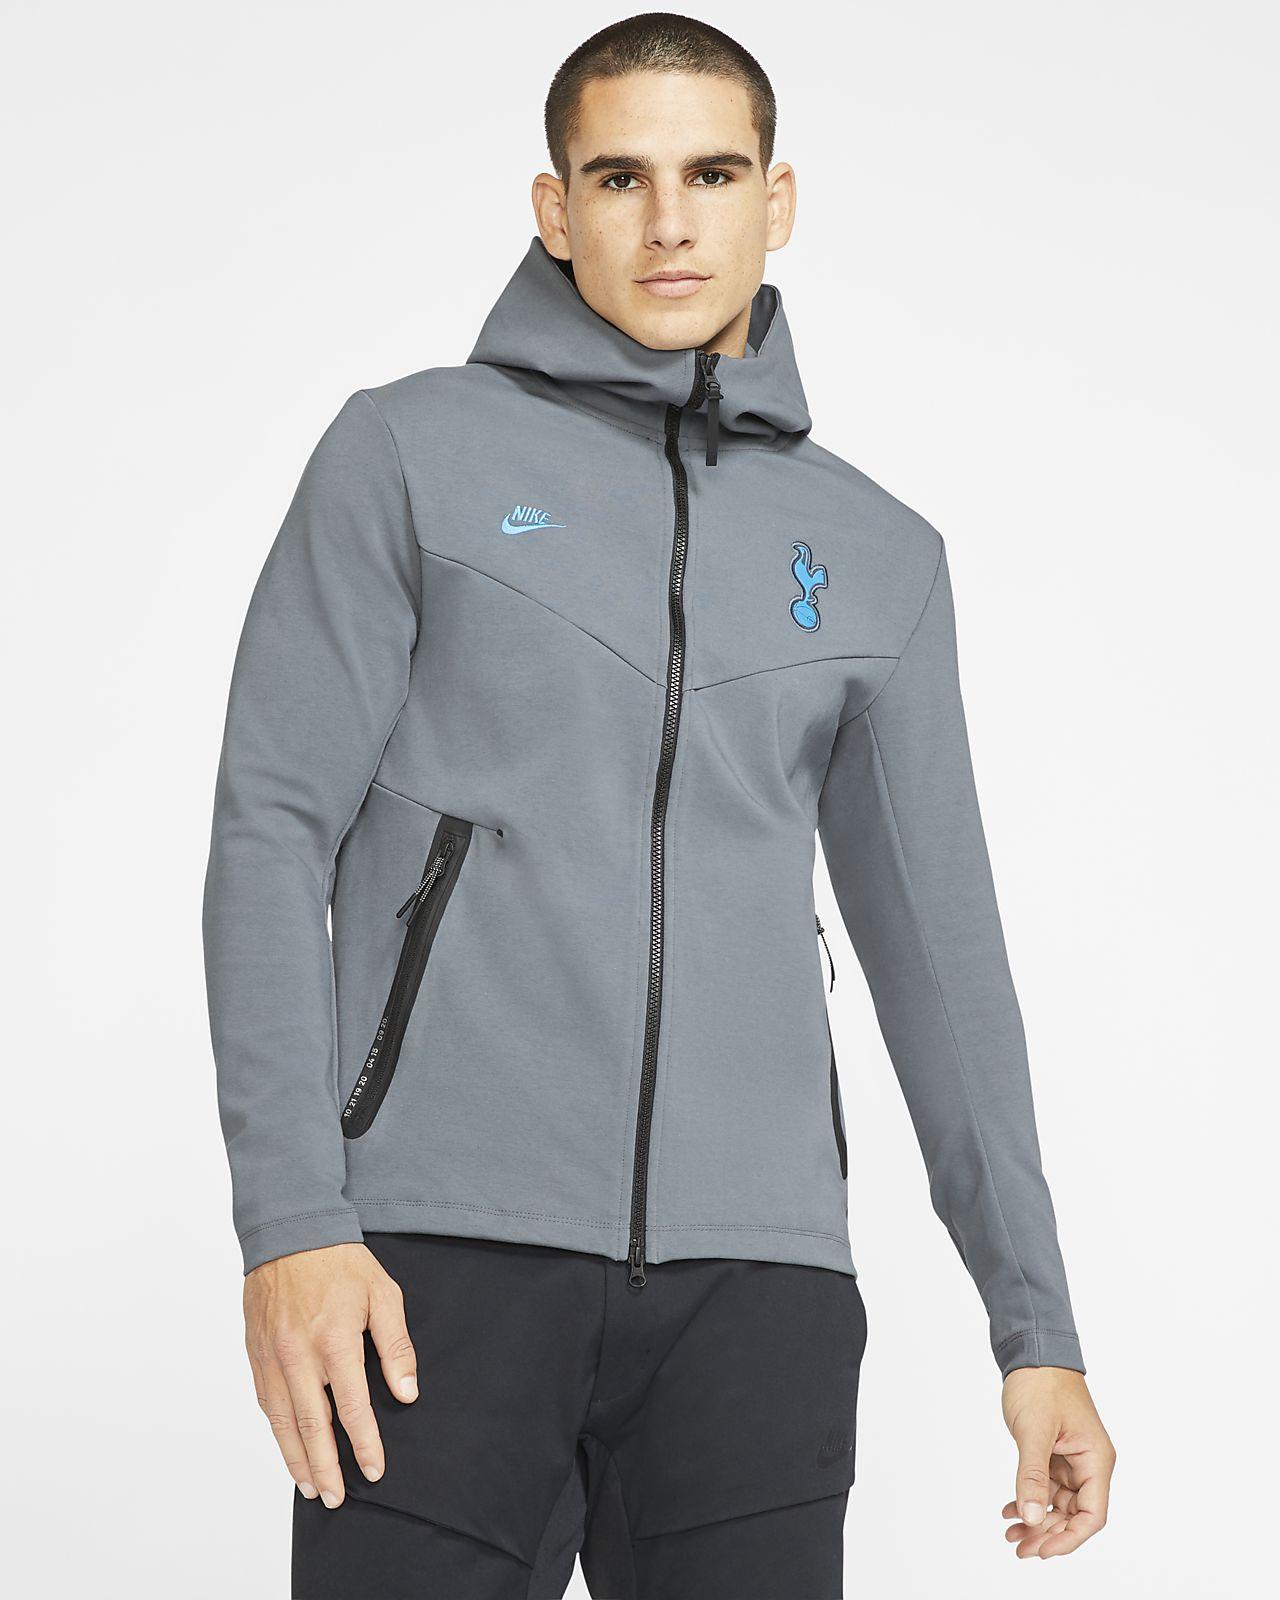 Nike Hotspurs Prestazioni Tottenham Felpa Ottica Zip up Blu